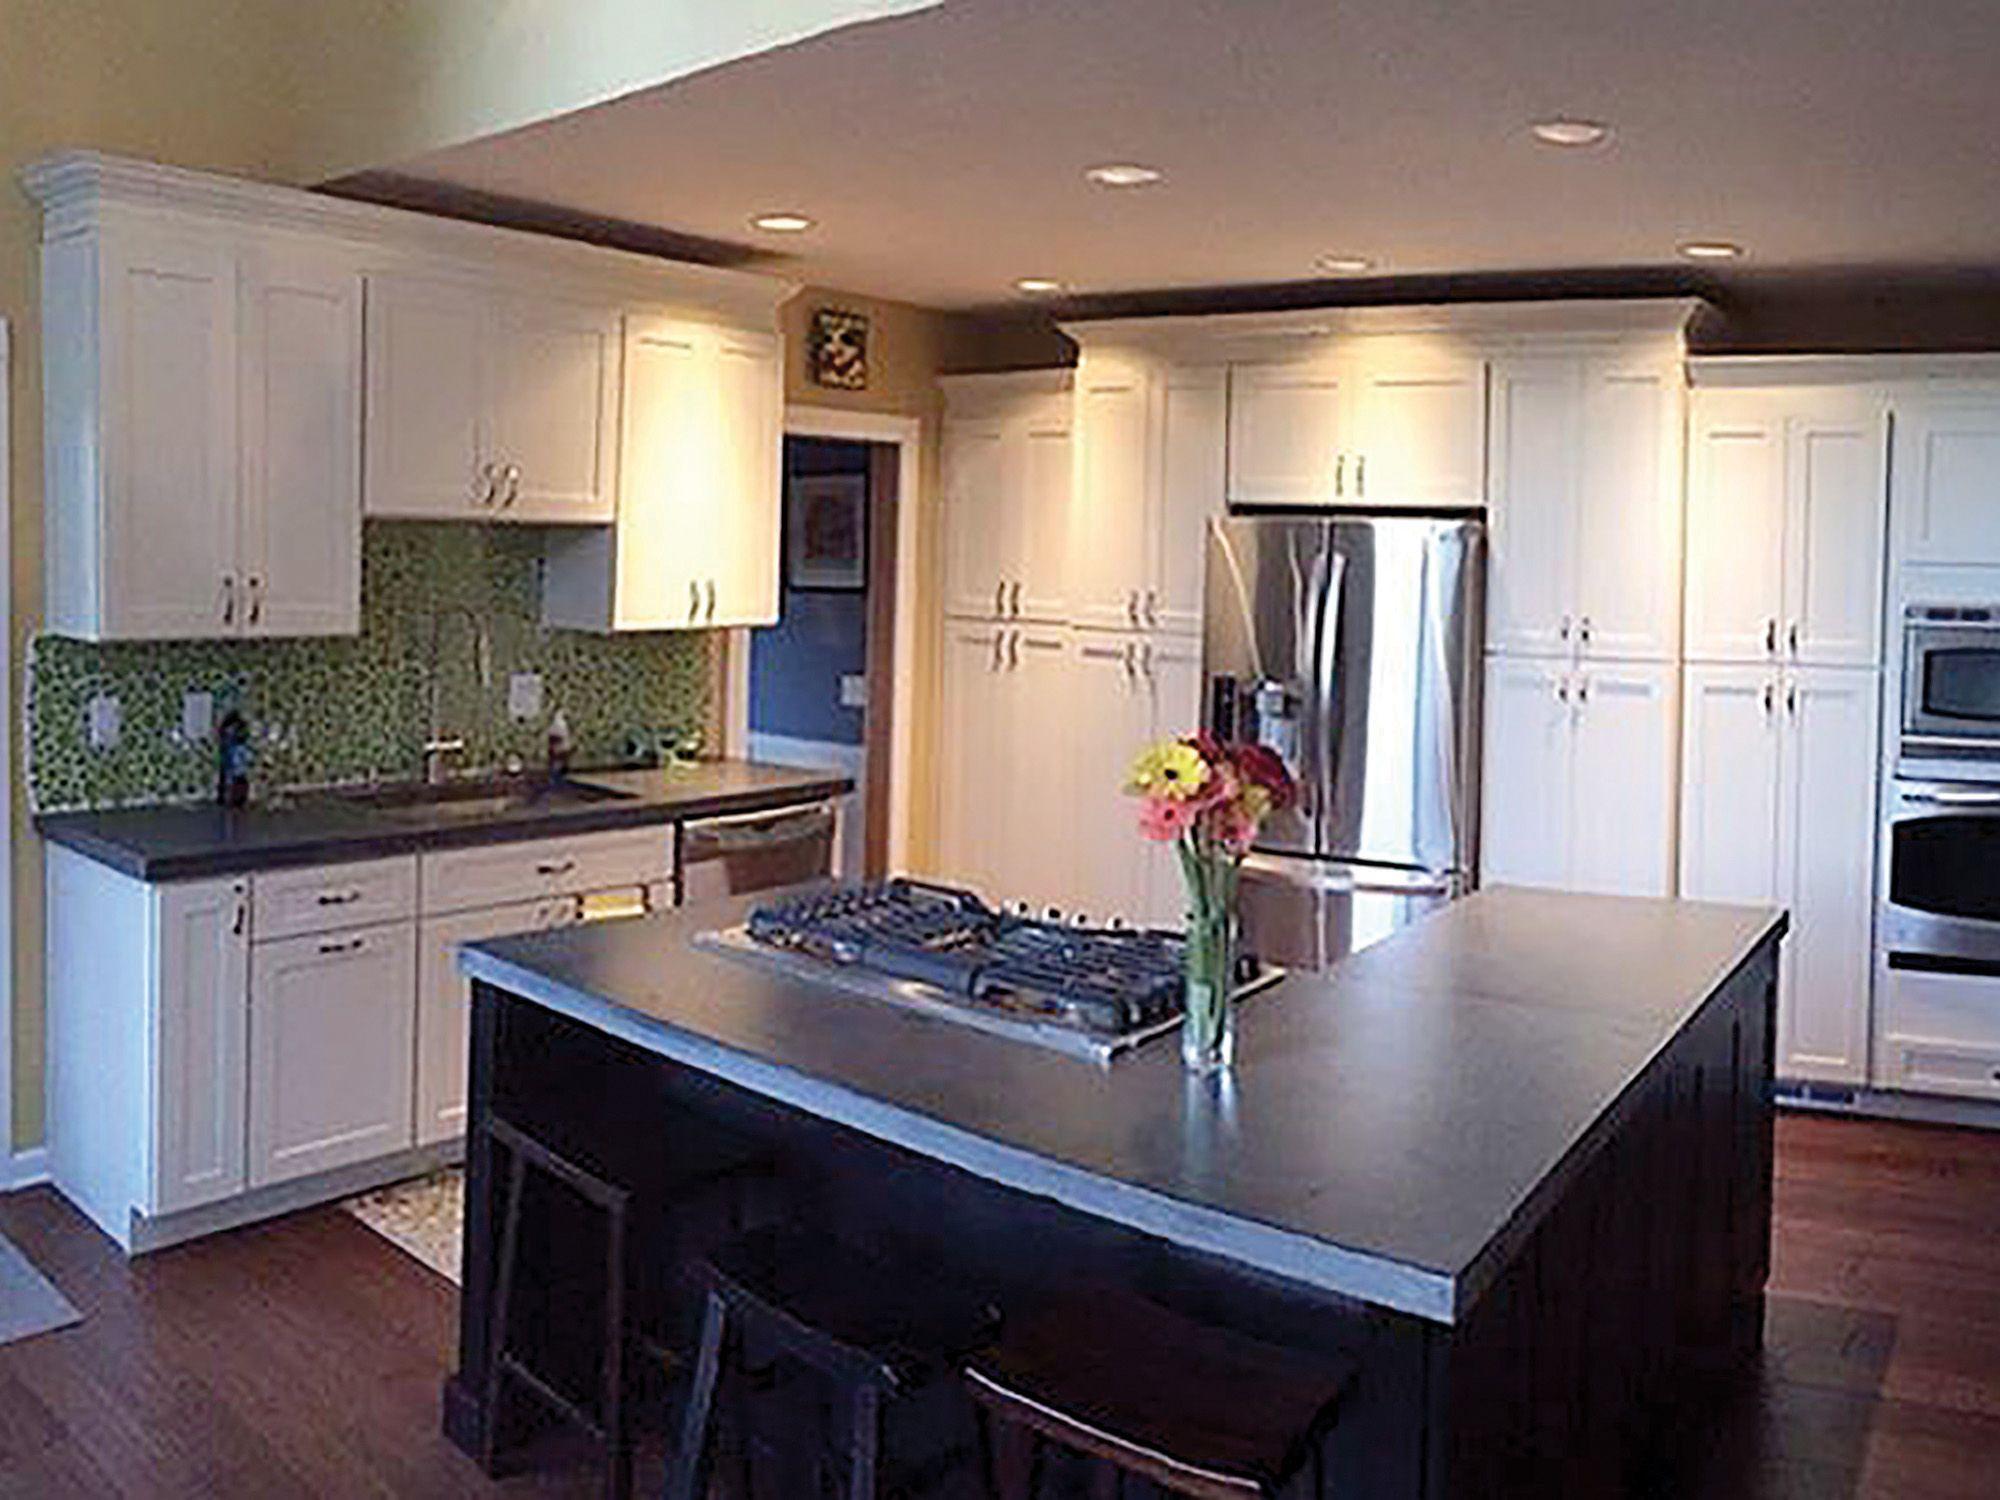 I Like The Cabinets Around The Refrigerator Bellevue Washington Kitchen Renovation Features Cliqstudios Dayton P Kitchen Remodel Home Kitchens Kitchen Design